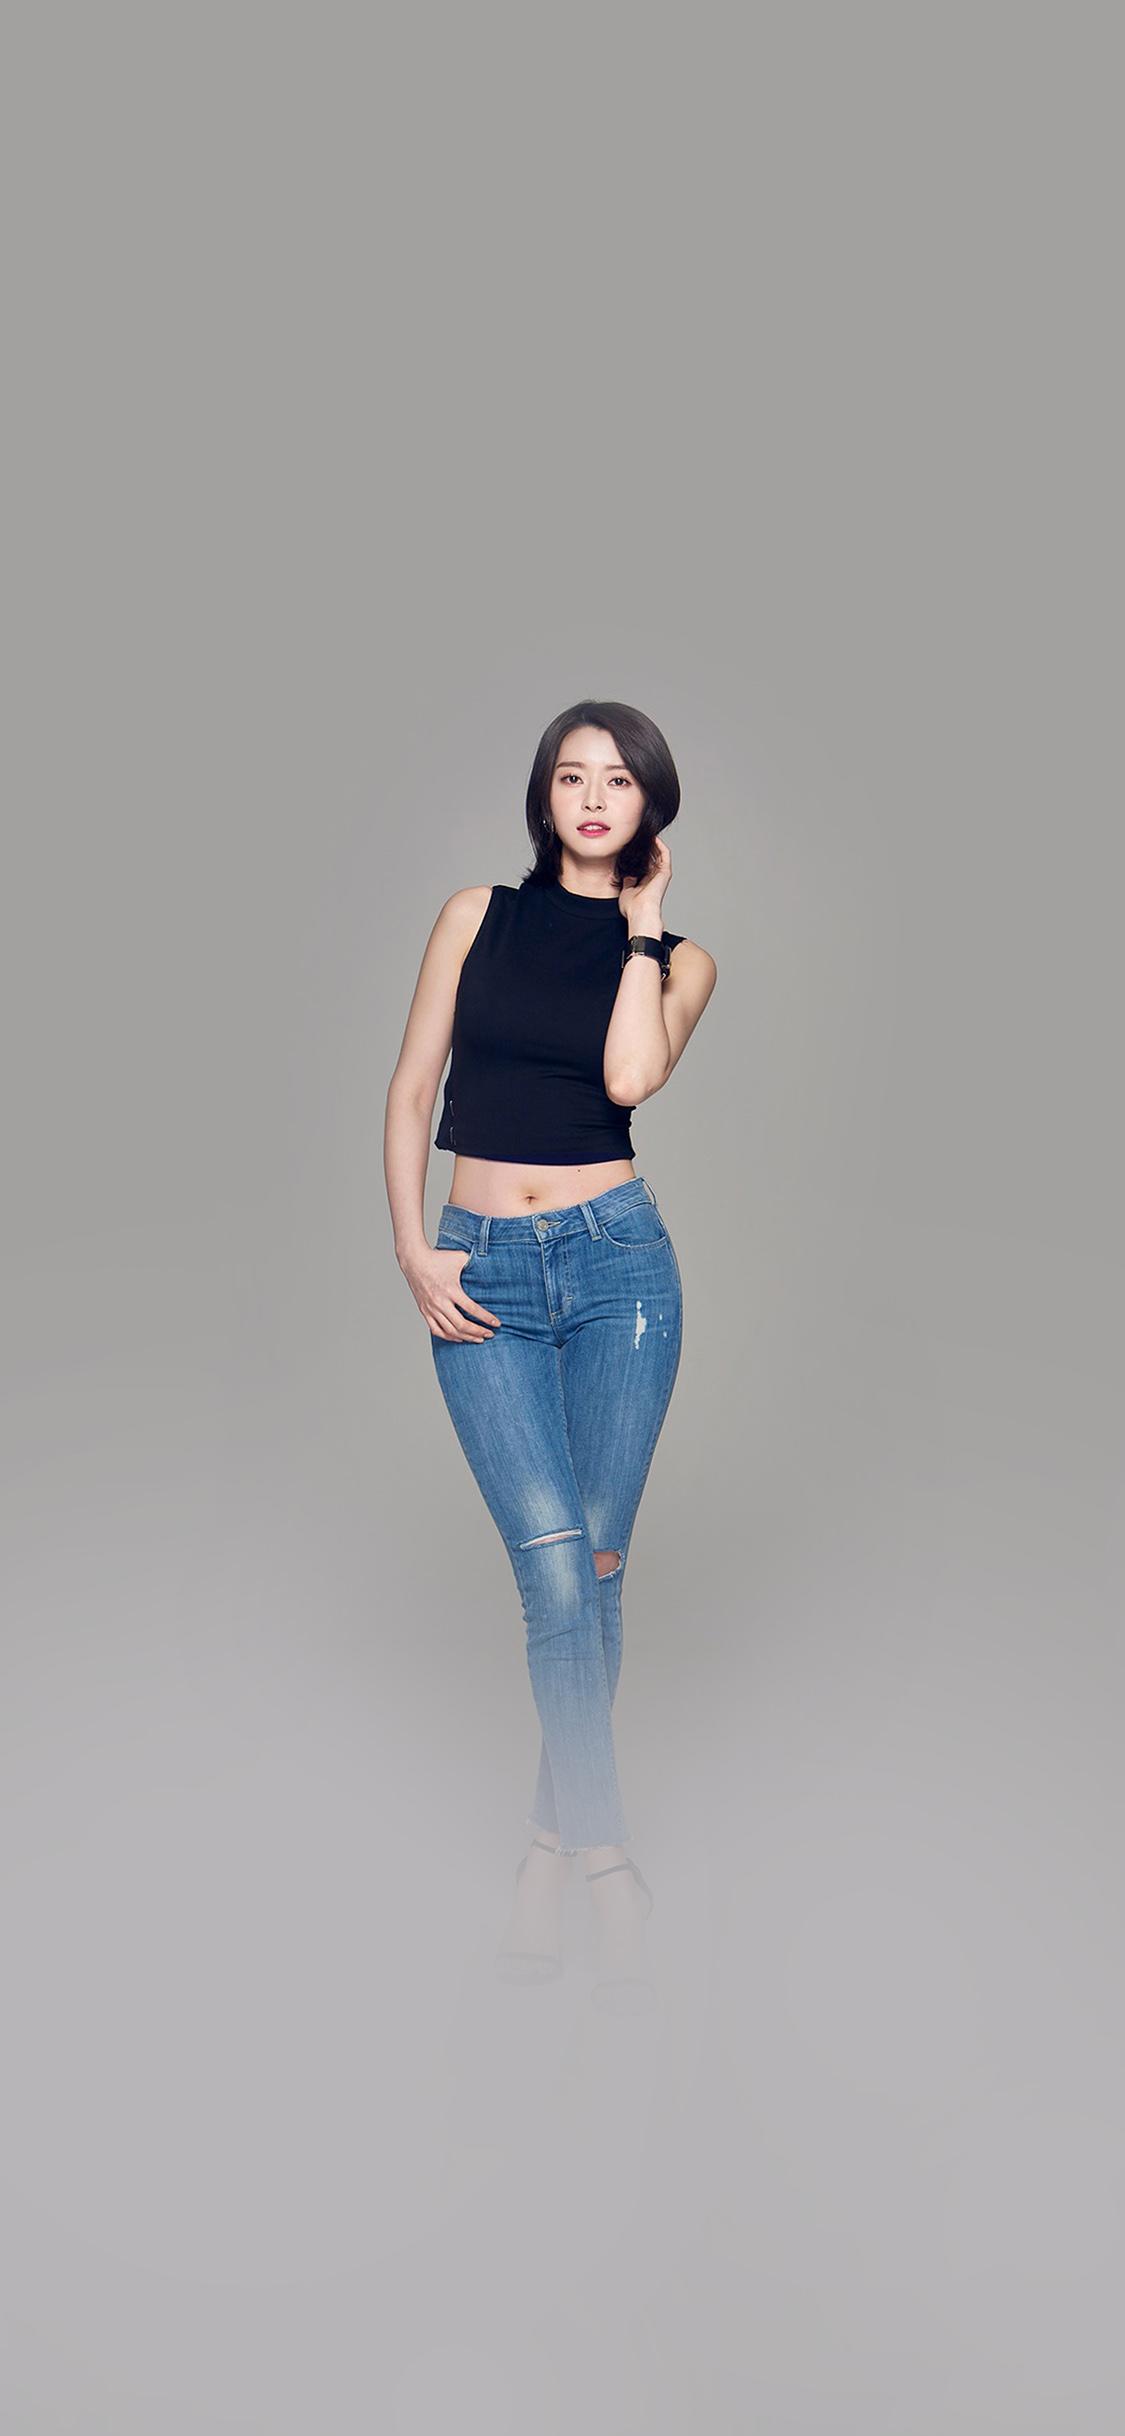 Victoria Secret Wallpaper Iphone 5 Iphone